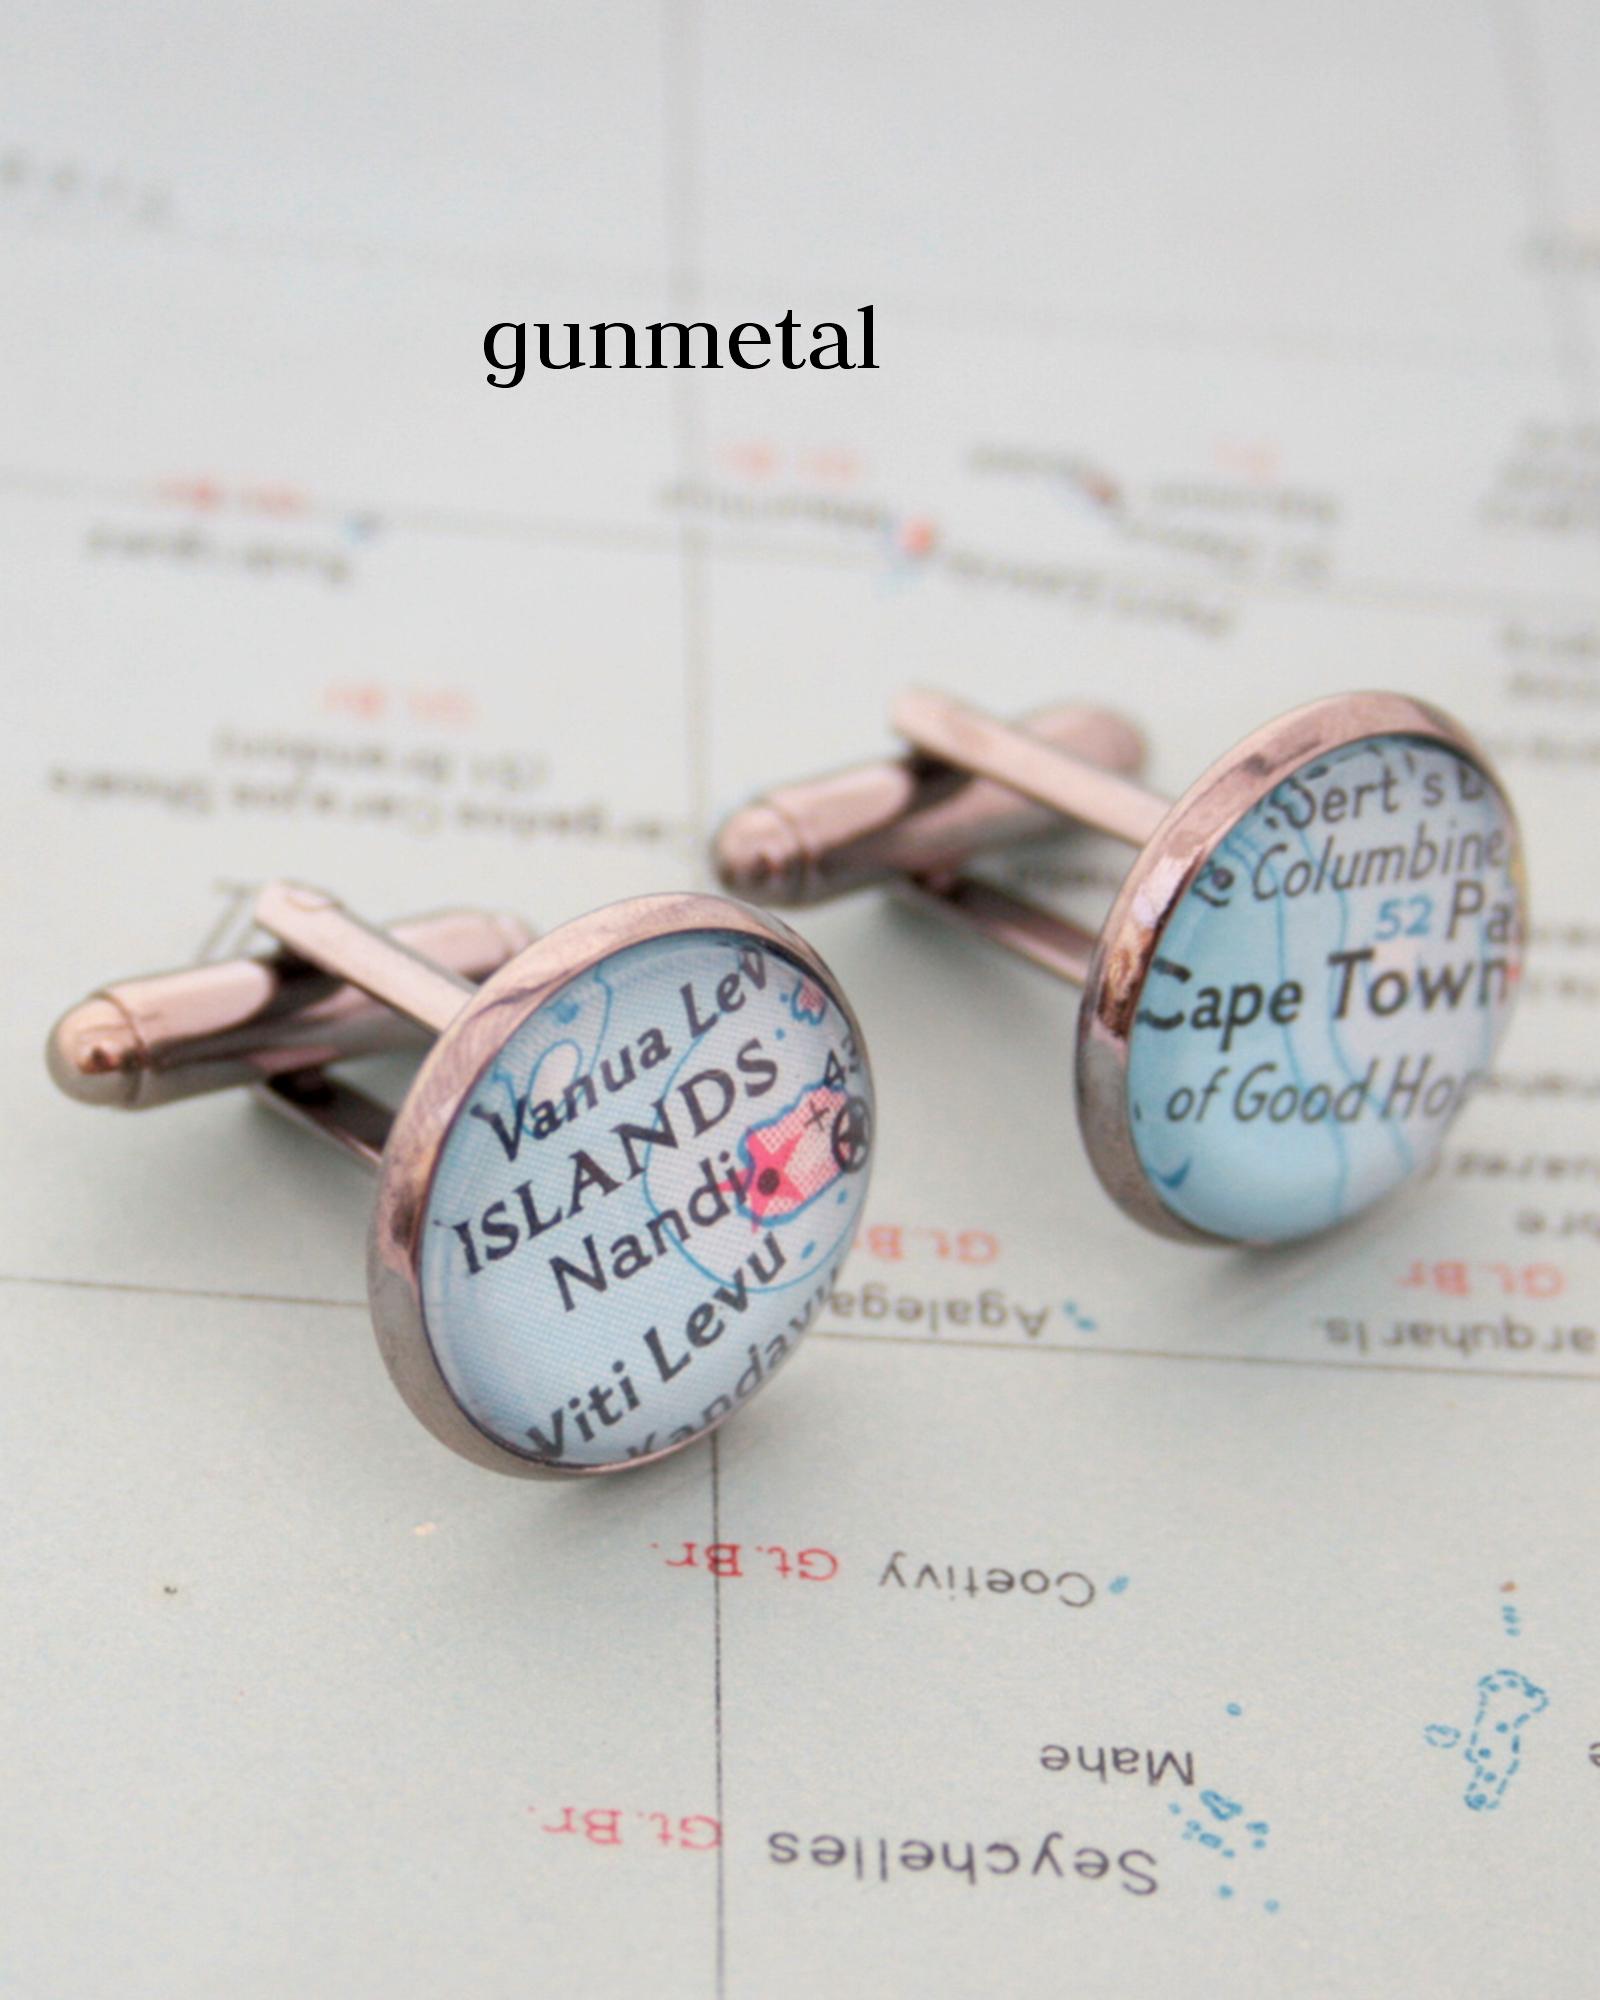 custom map cufflinks in gunmetal black colour